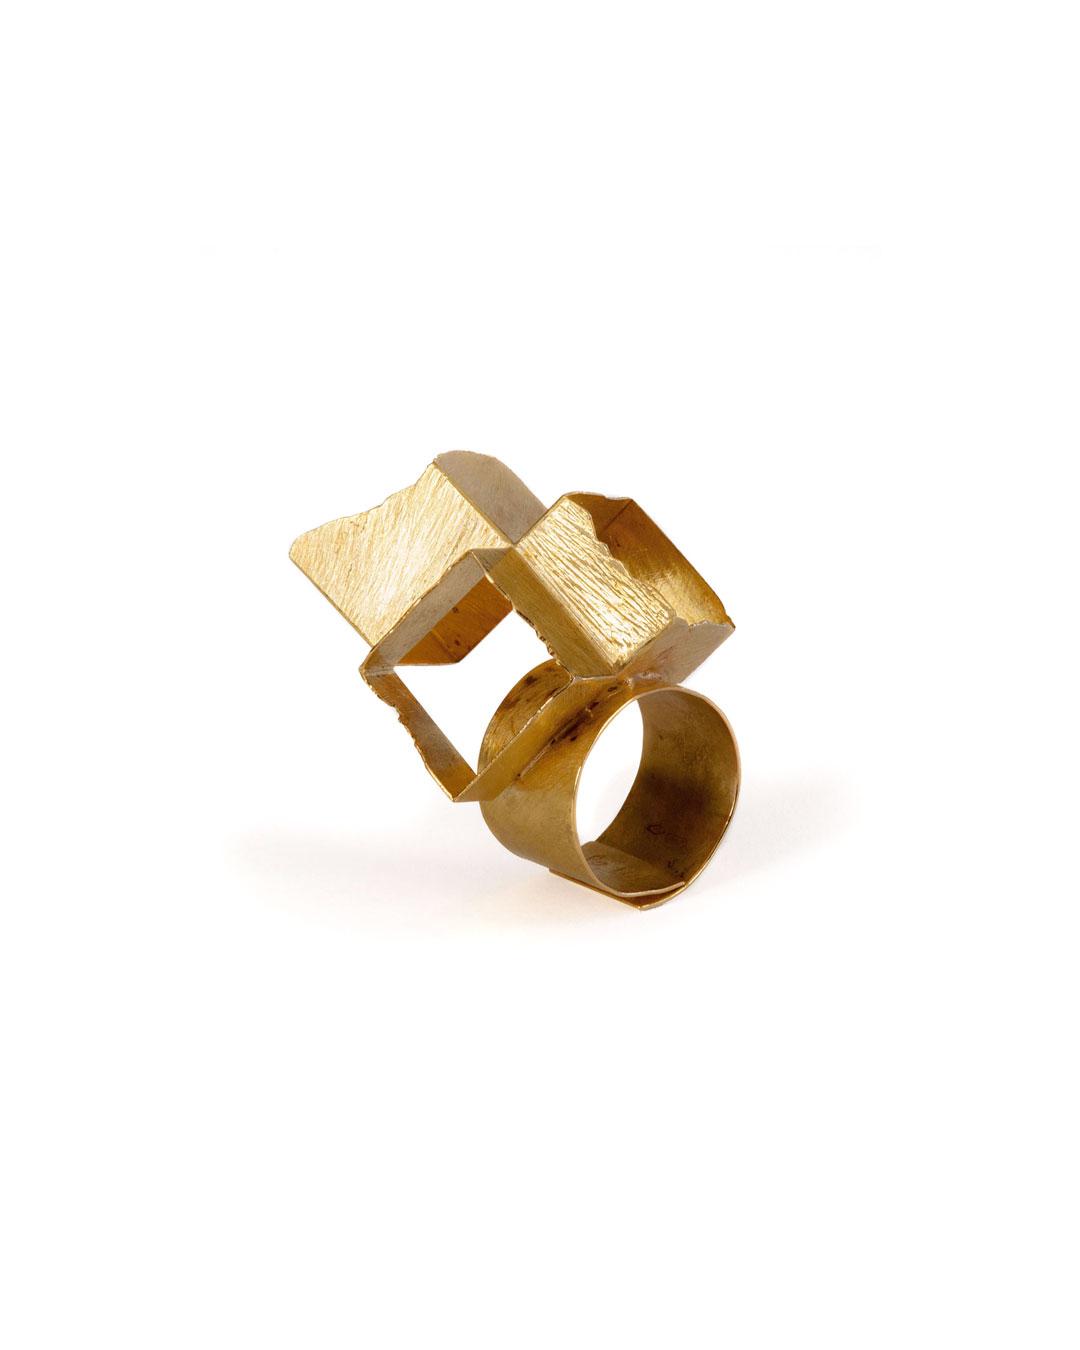 Stefano Marchetti, untitled, 2008, ring; gold, 50 x 30 x 30 mm, €3700